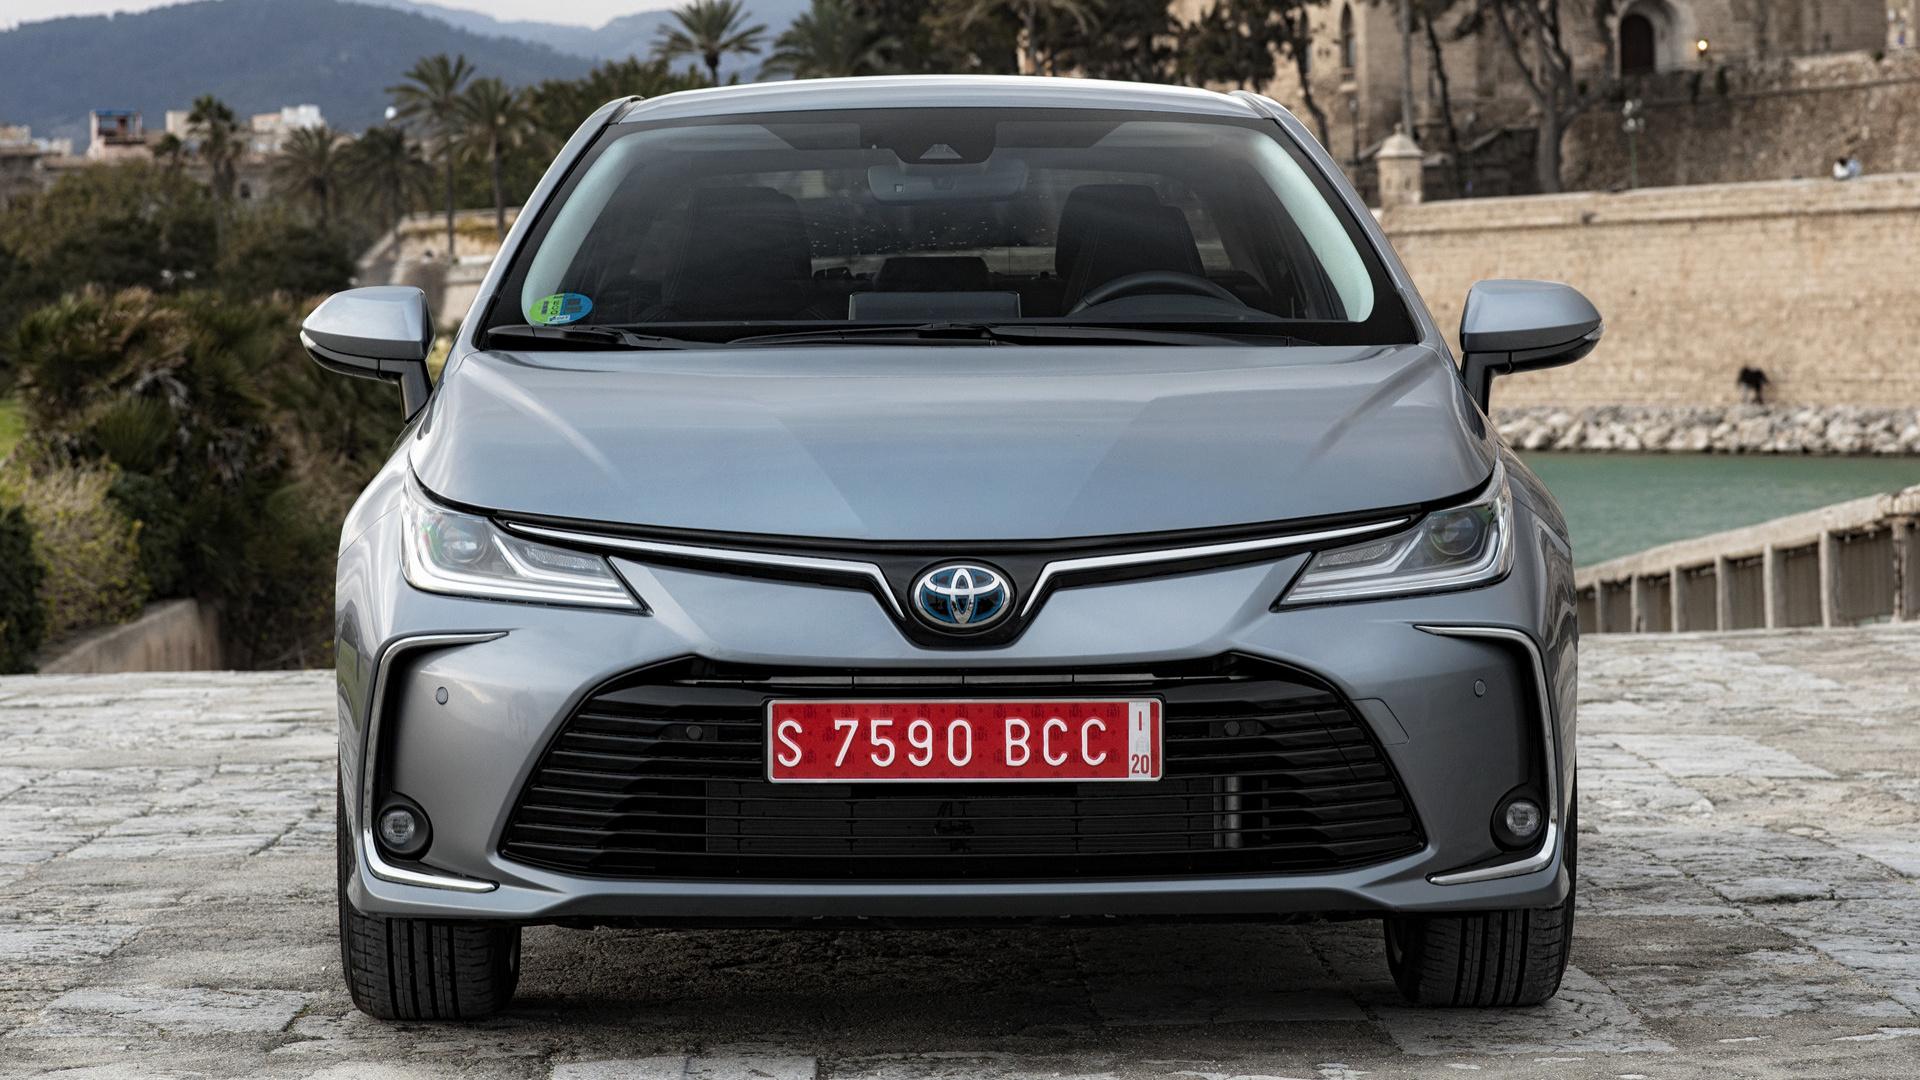 2019 Toyota Corolla Sedan Hybrid - Wallpapers and HD Images | Car Pixel